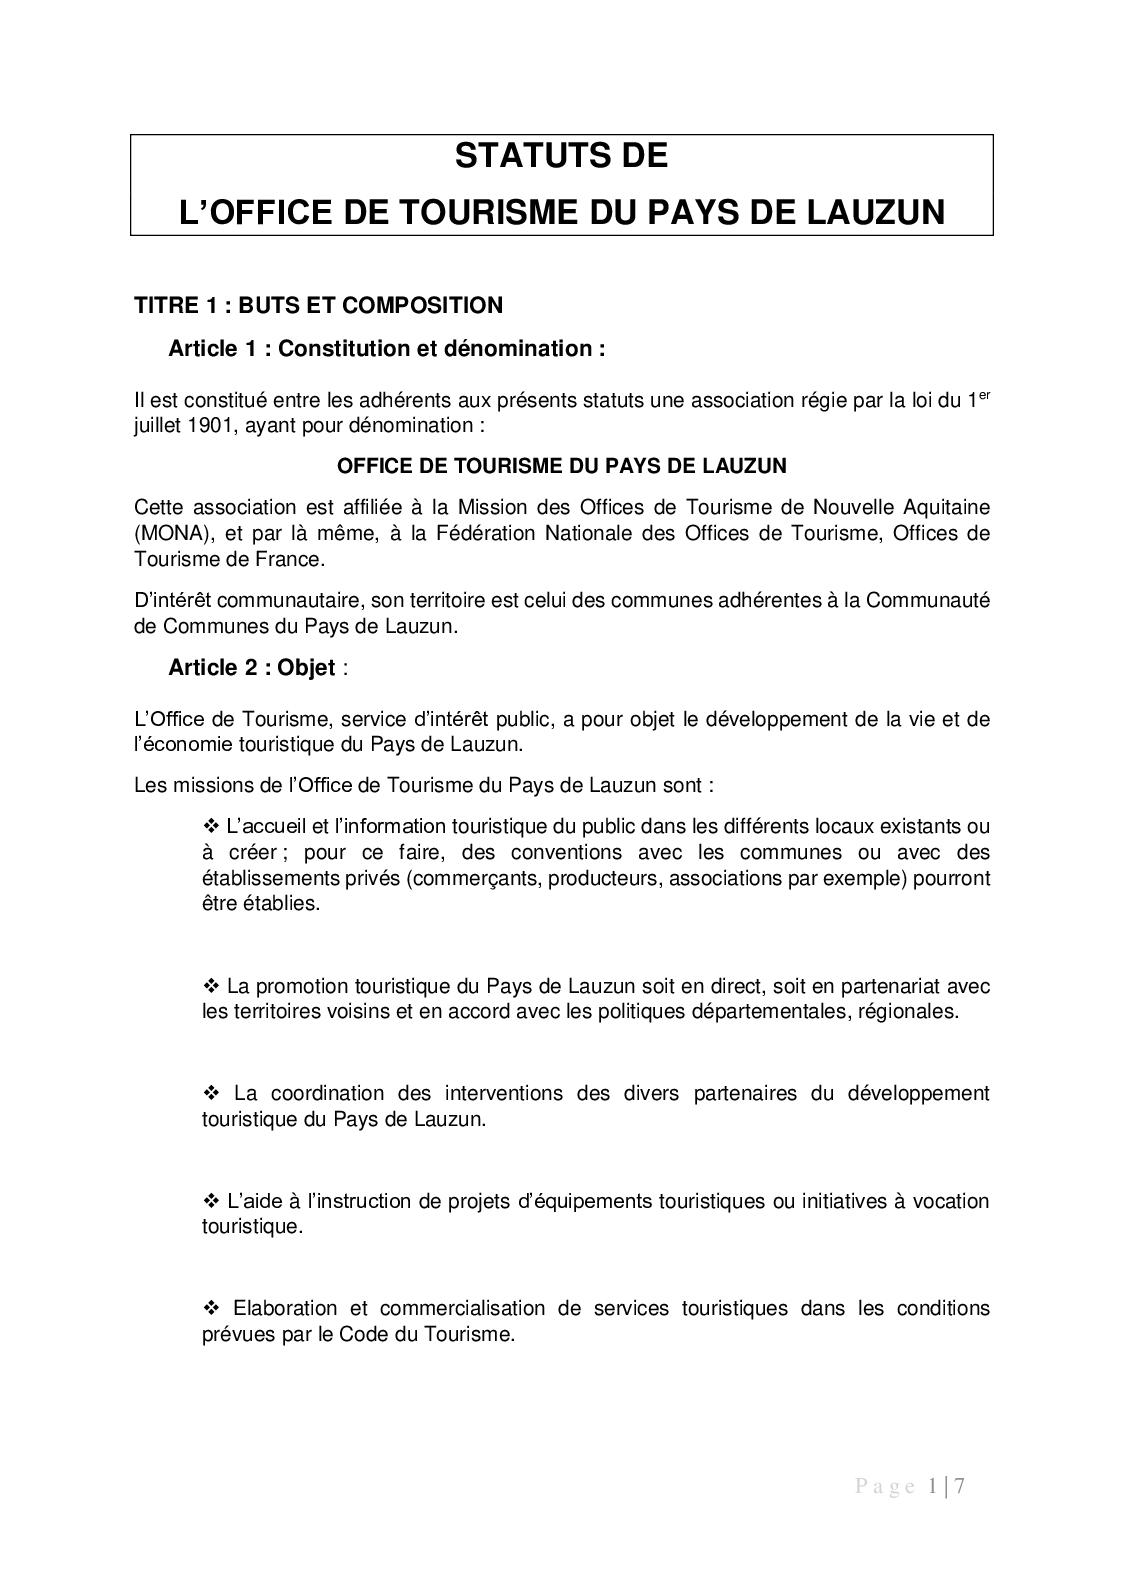 Calameo Statuts De L Otpl 2018 Valides 15112018